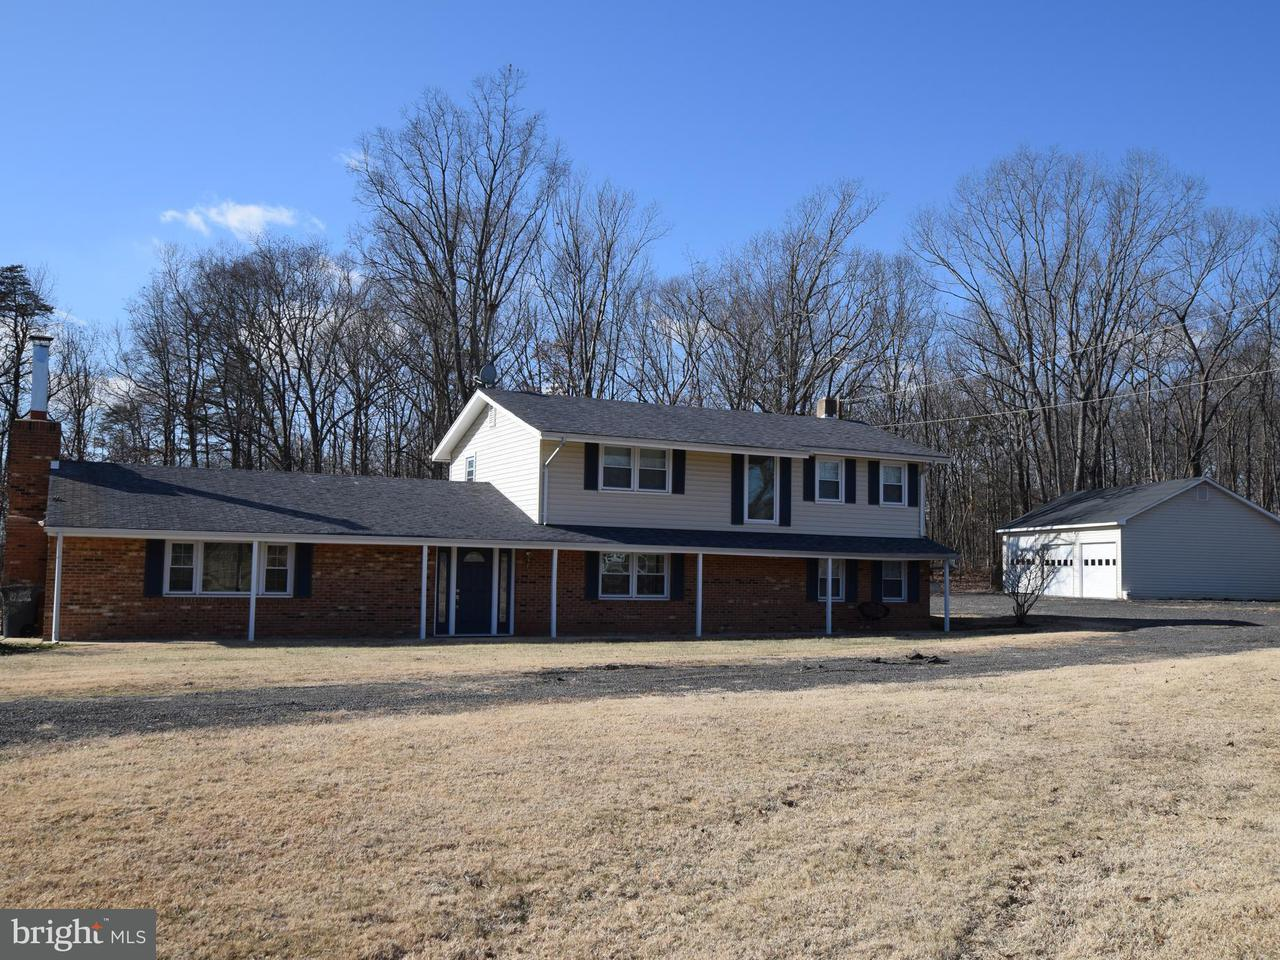 獨棟家庭住宅 為 出售 在 5008 SUDLEY Road 5008 SUDLEY Road Catharpin, 弗吉尼亞州 20143 美國